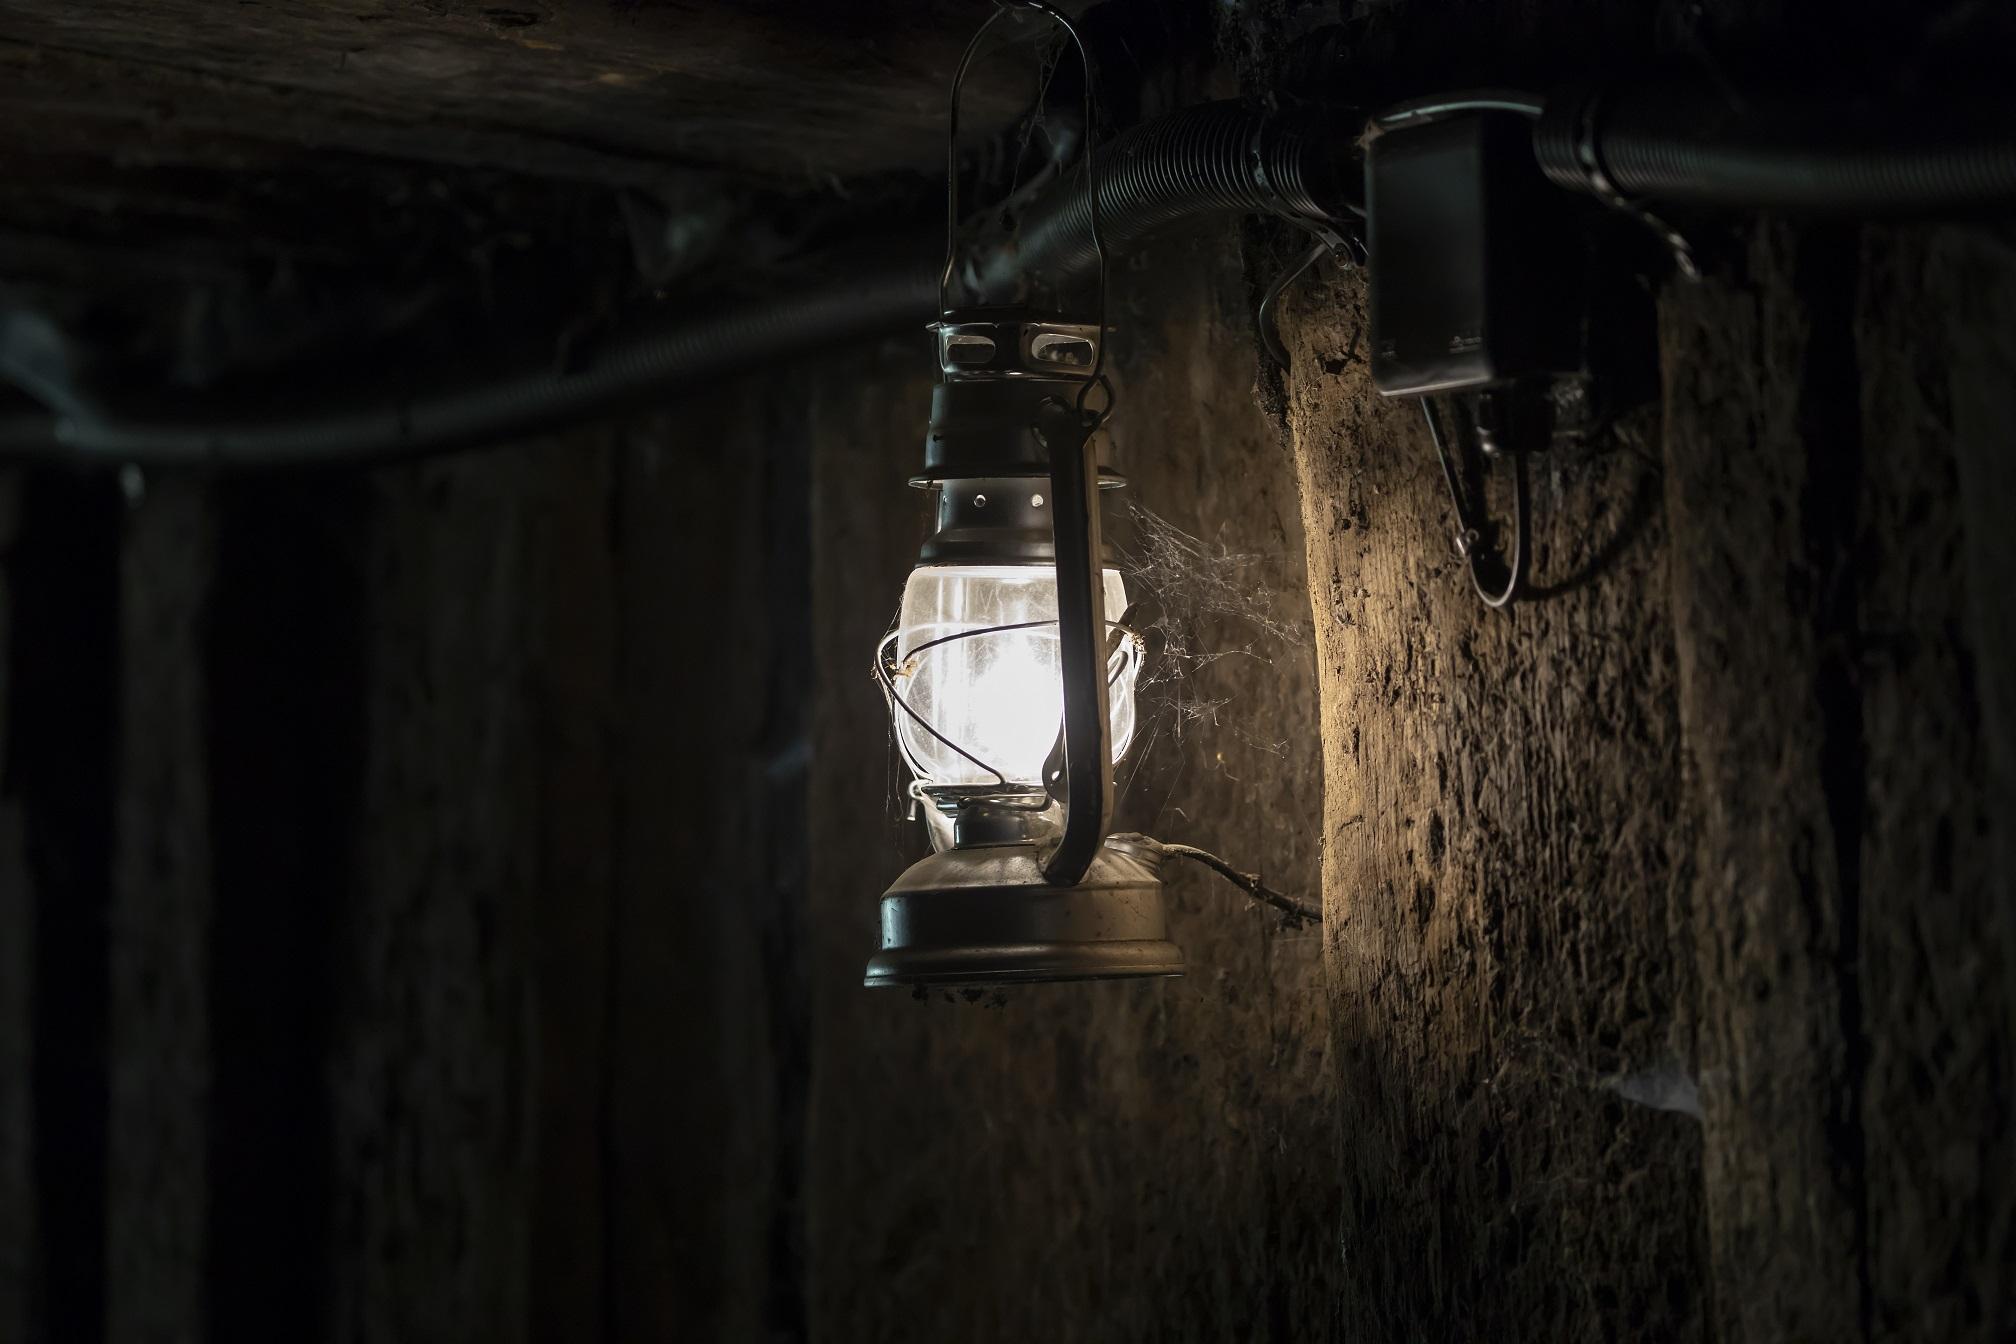 lamp in mine 5HUGJWQ #экономика Bitcoin Embassy Georgia, featured, Абхазия, Абхазия. Диалог, Александр Суладзе, Ингури ГЭС, криптовалюта, майнинг, Черноморэнерго, электроэнергия